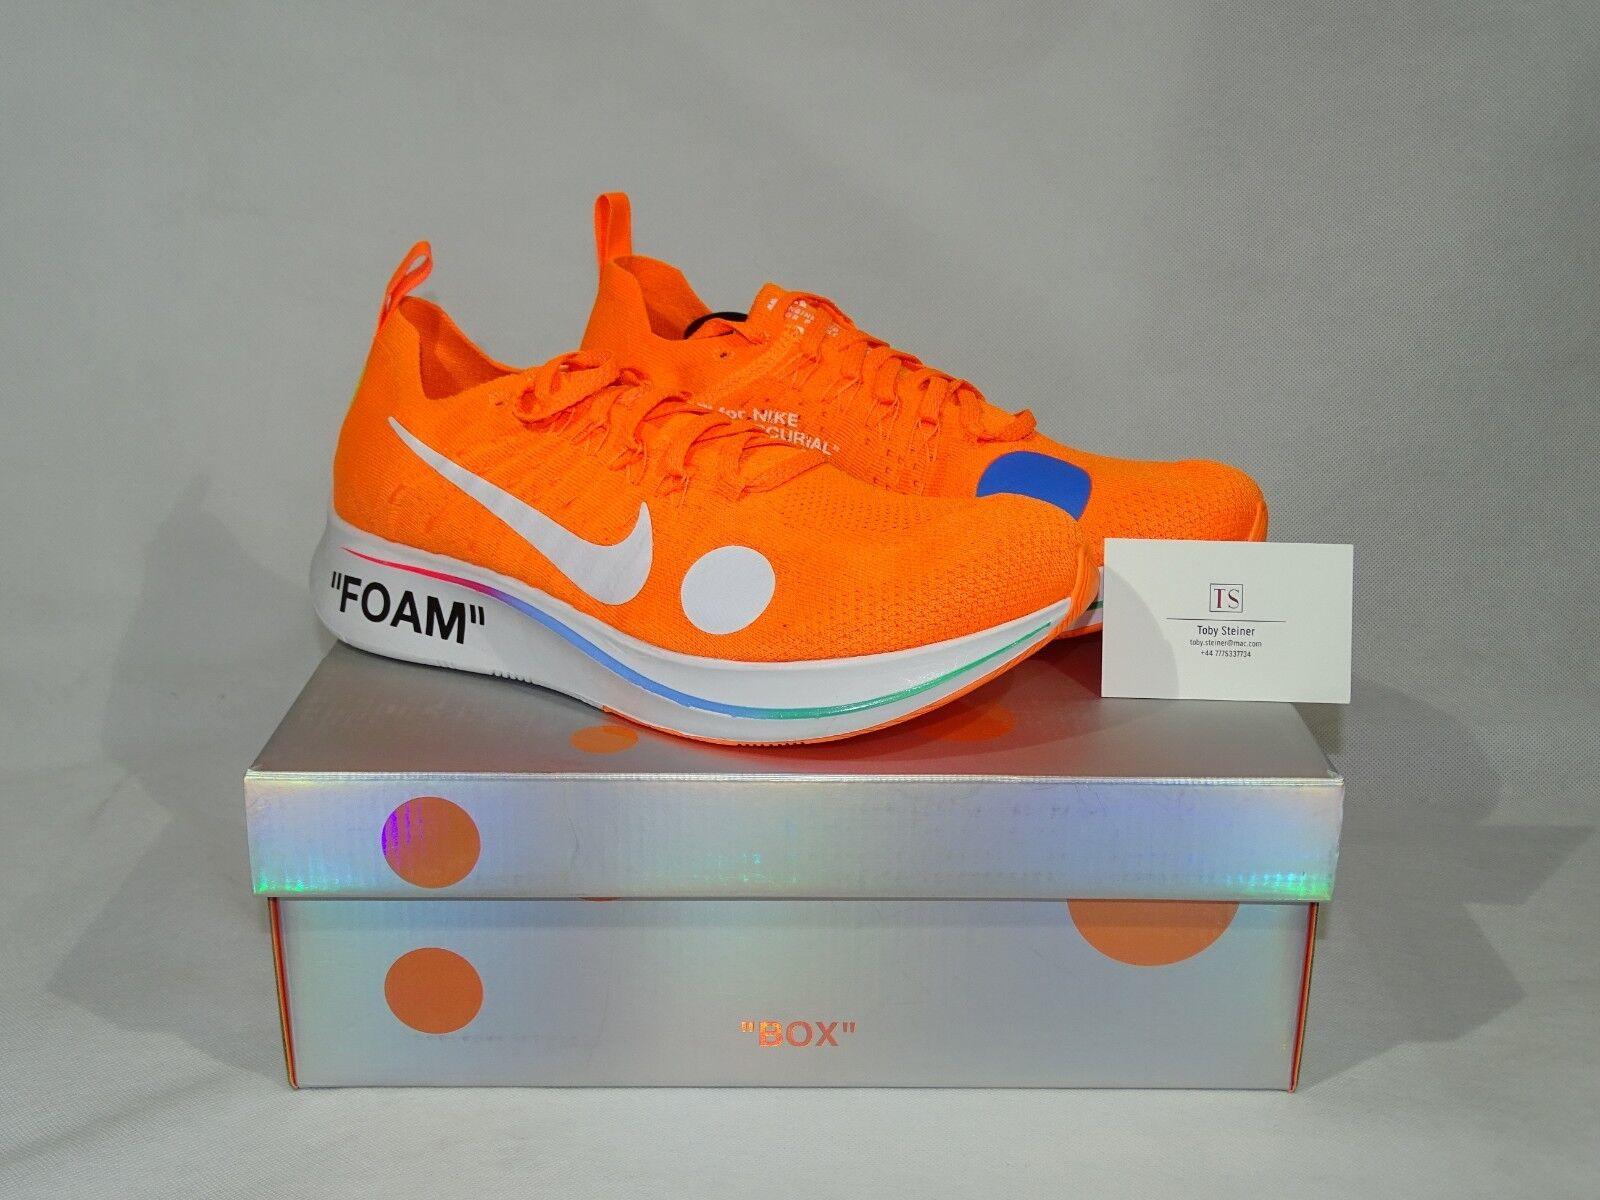 Hueso X Nike Mercurial Zoom Fly Fly Zoom UK7.5/US8.5 dswt 100% Auténtico 1ed520